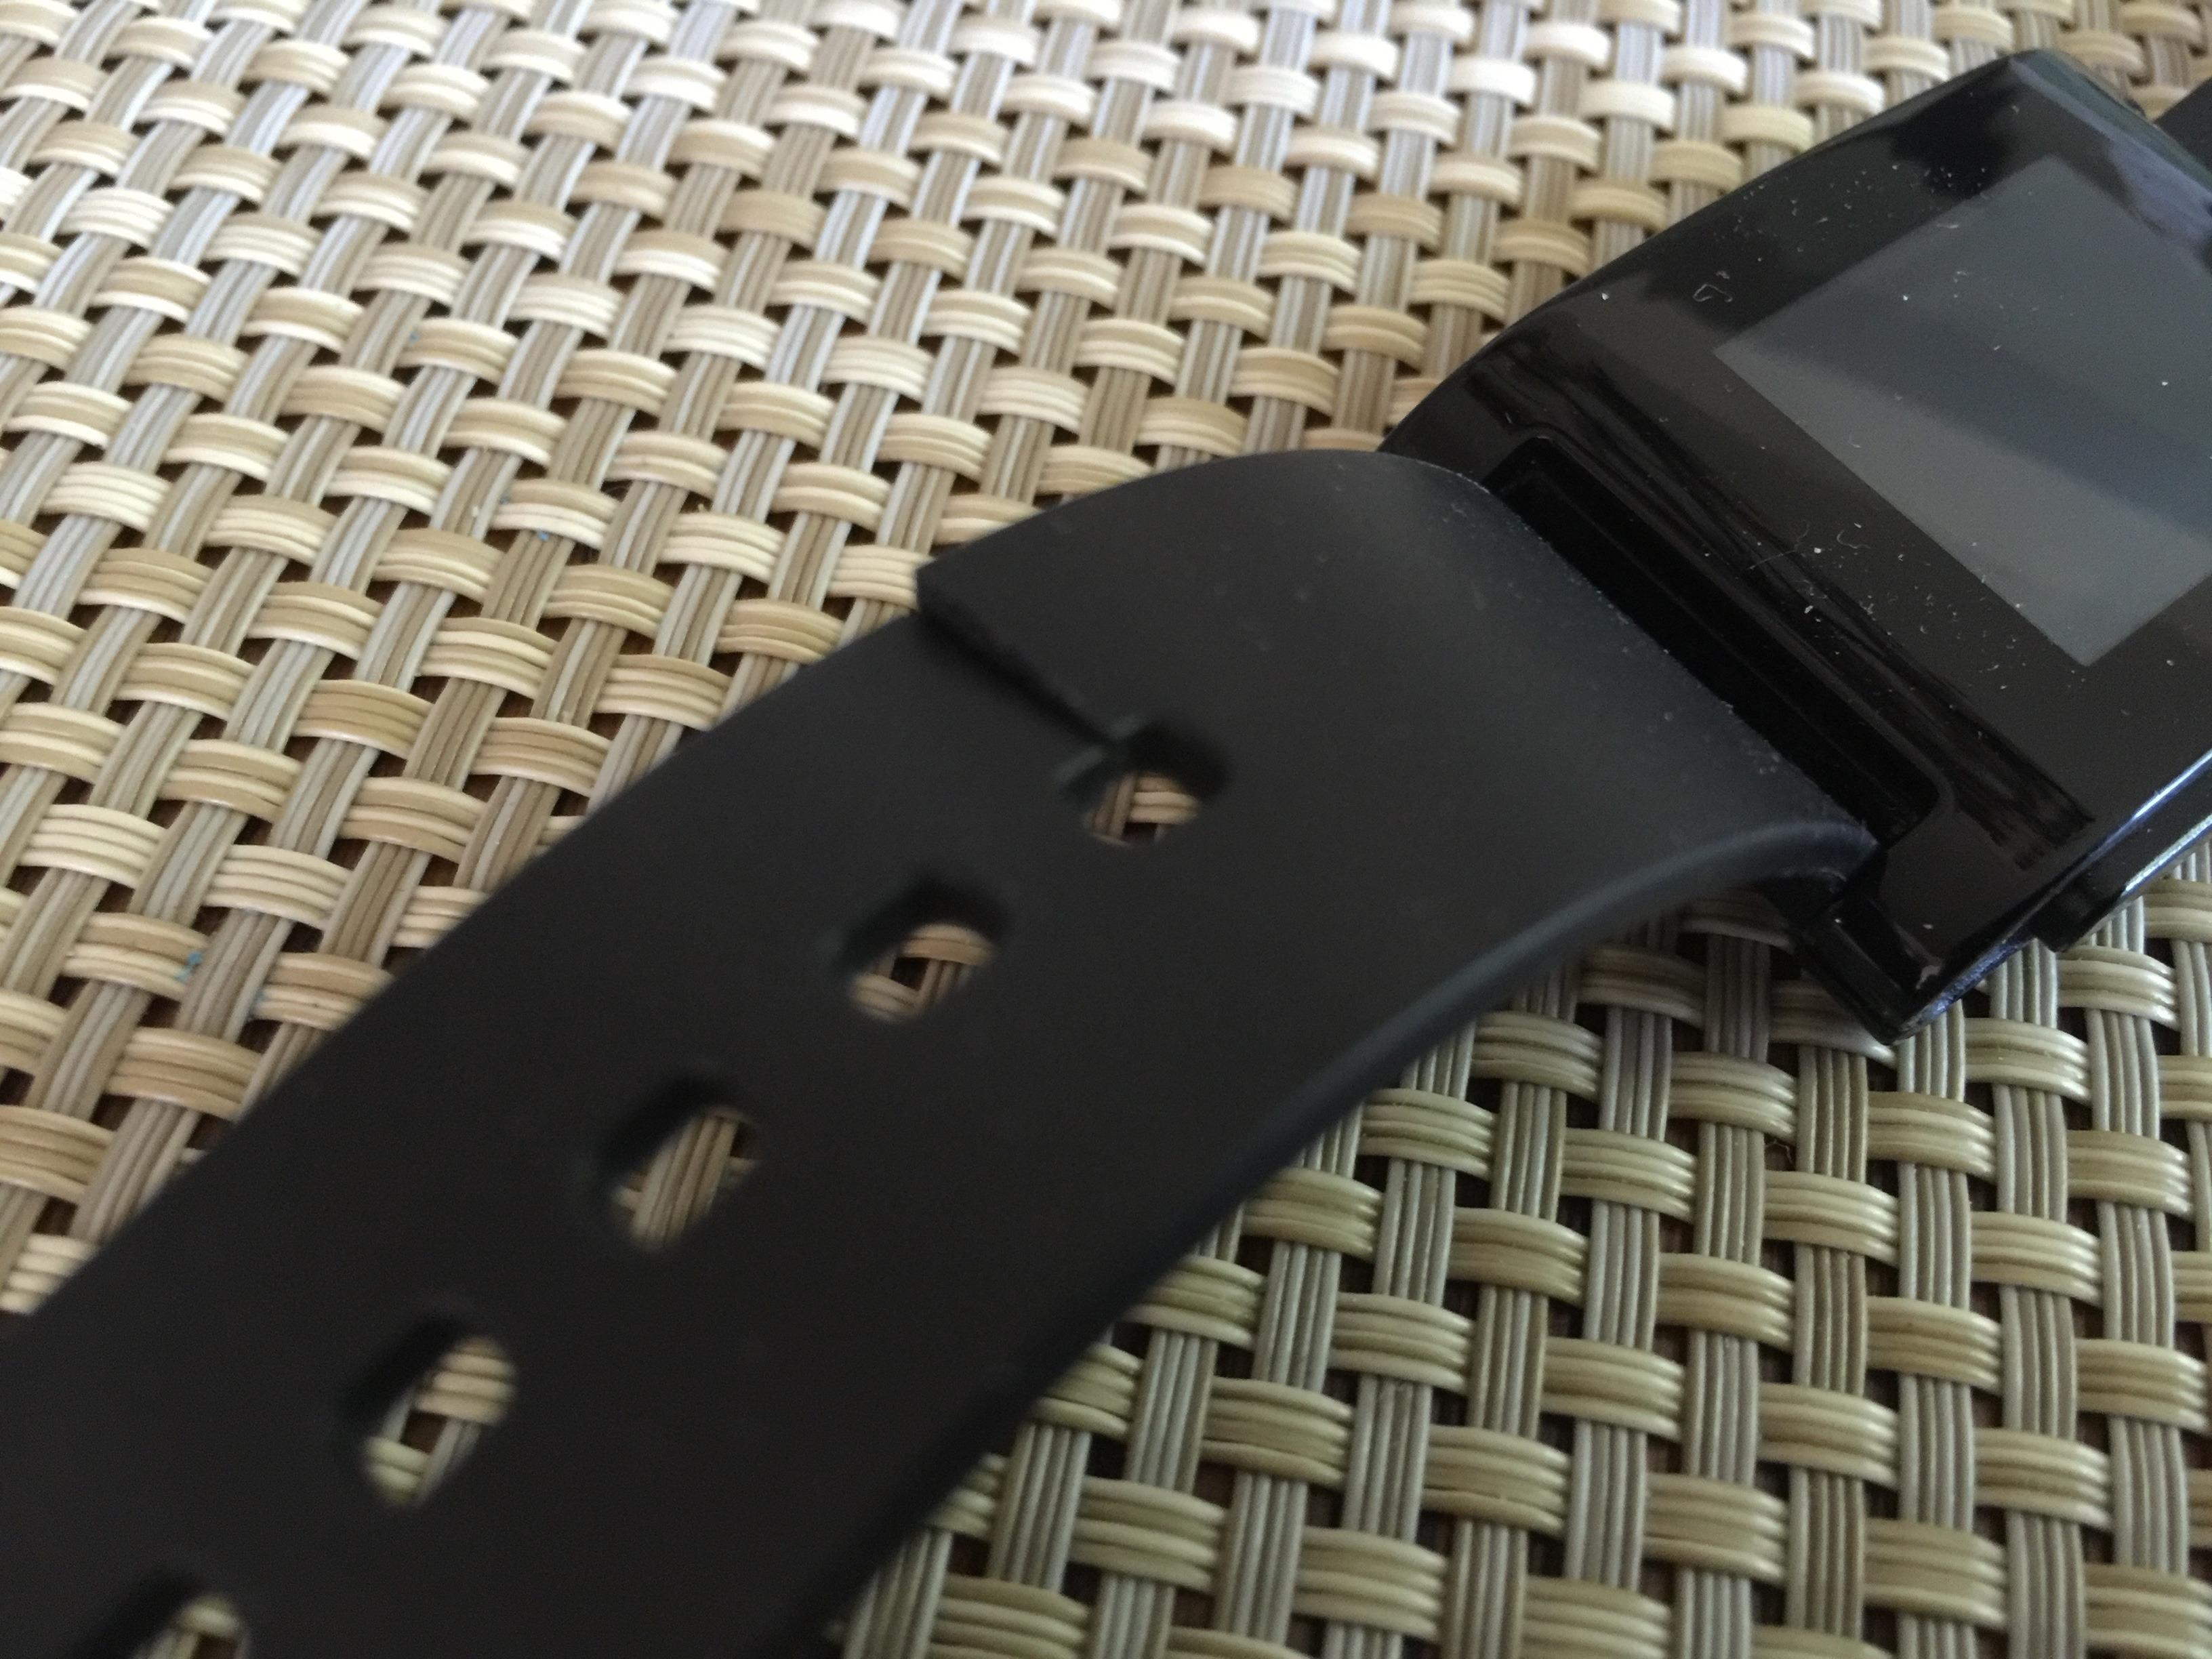 3D Printed Watch Band – Shashi Jain